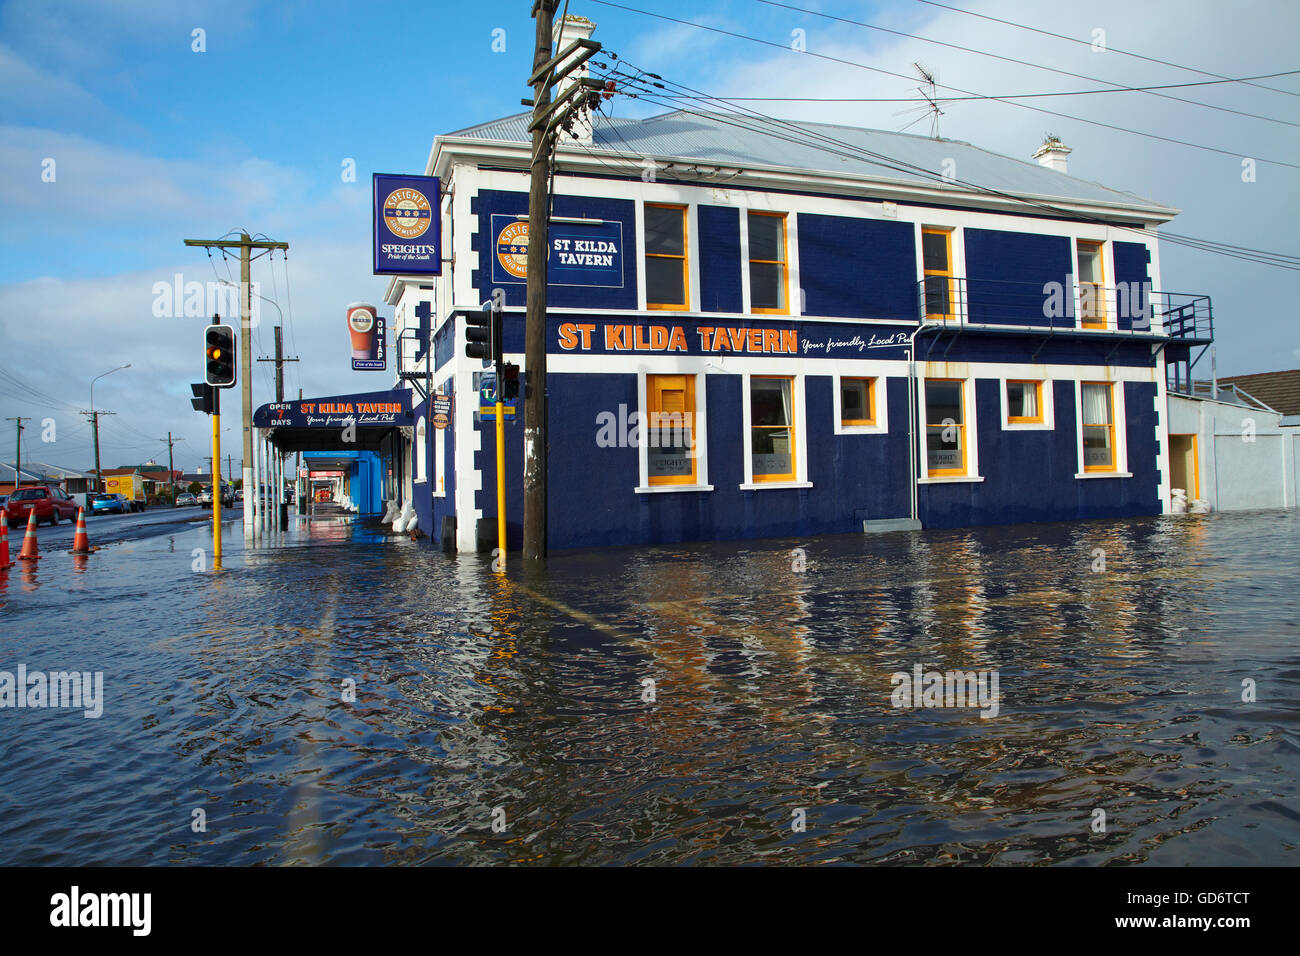 St Kilda Tavern during South Dunedin floods, Dunedin, South Island, New Zealand Stock Photo